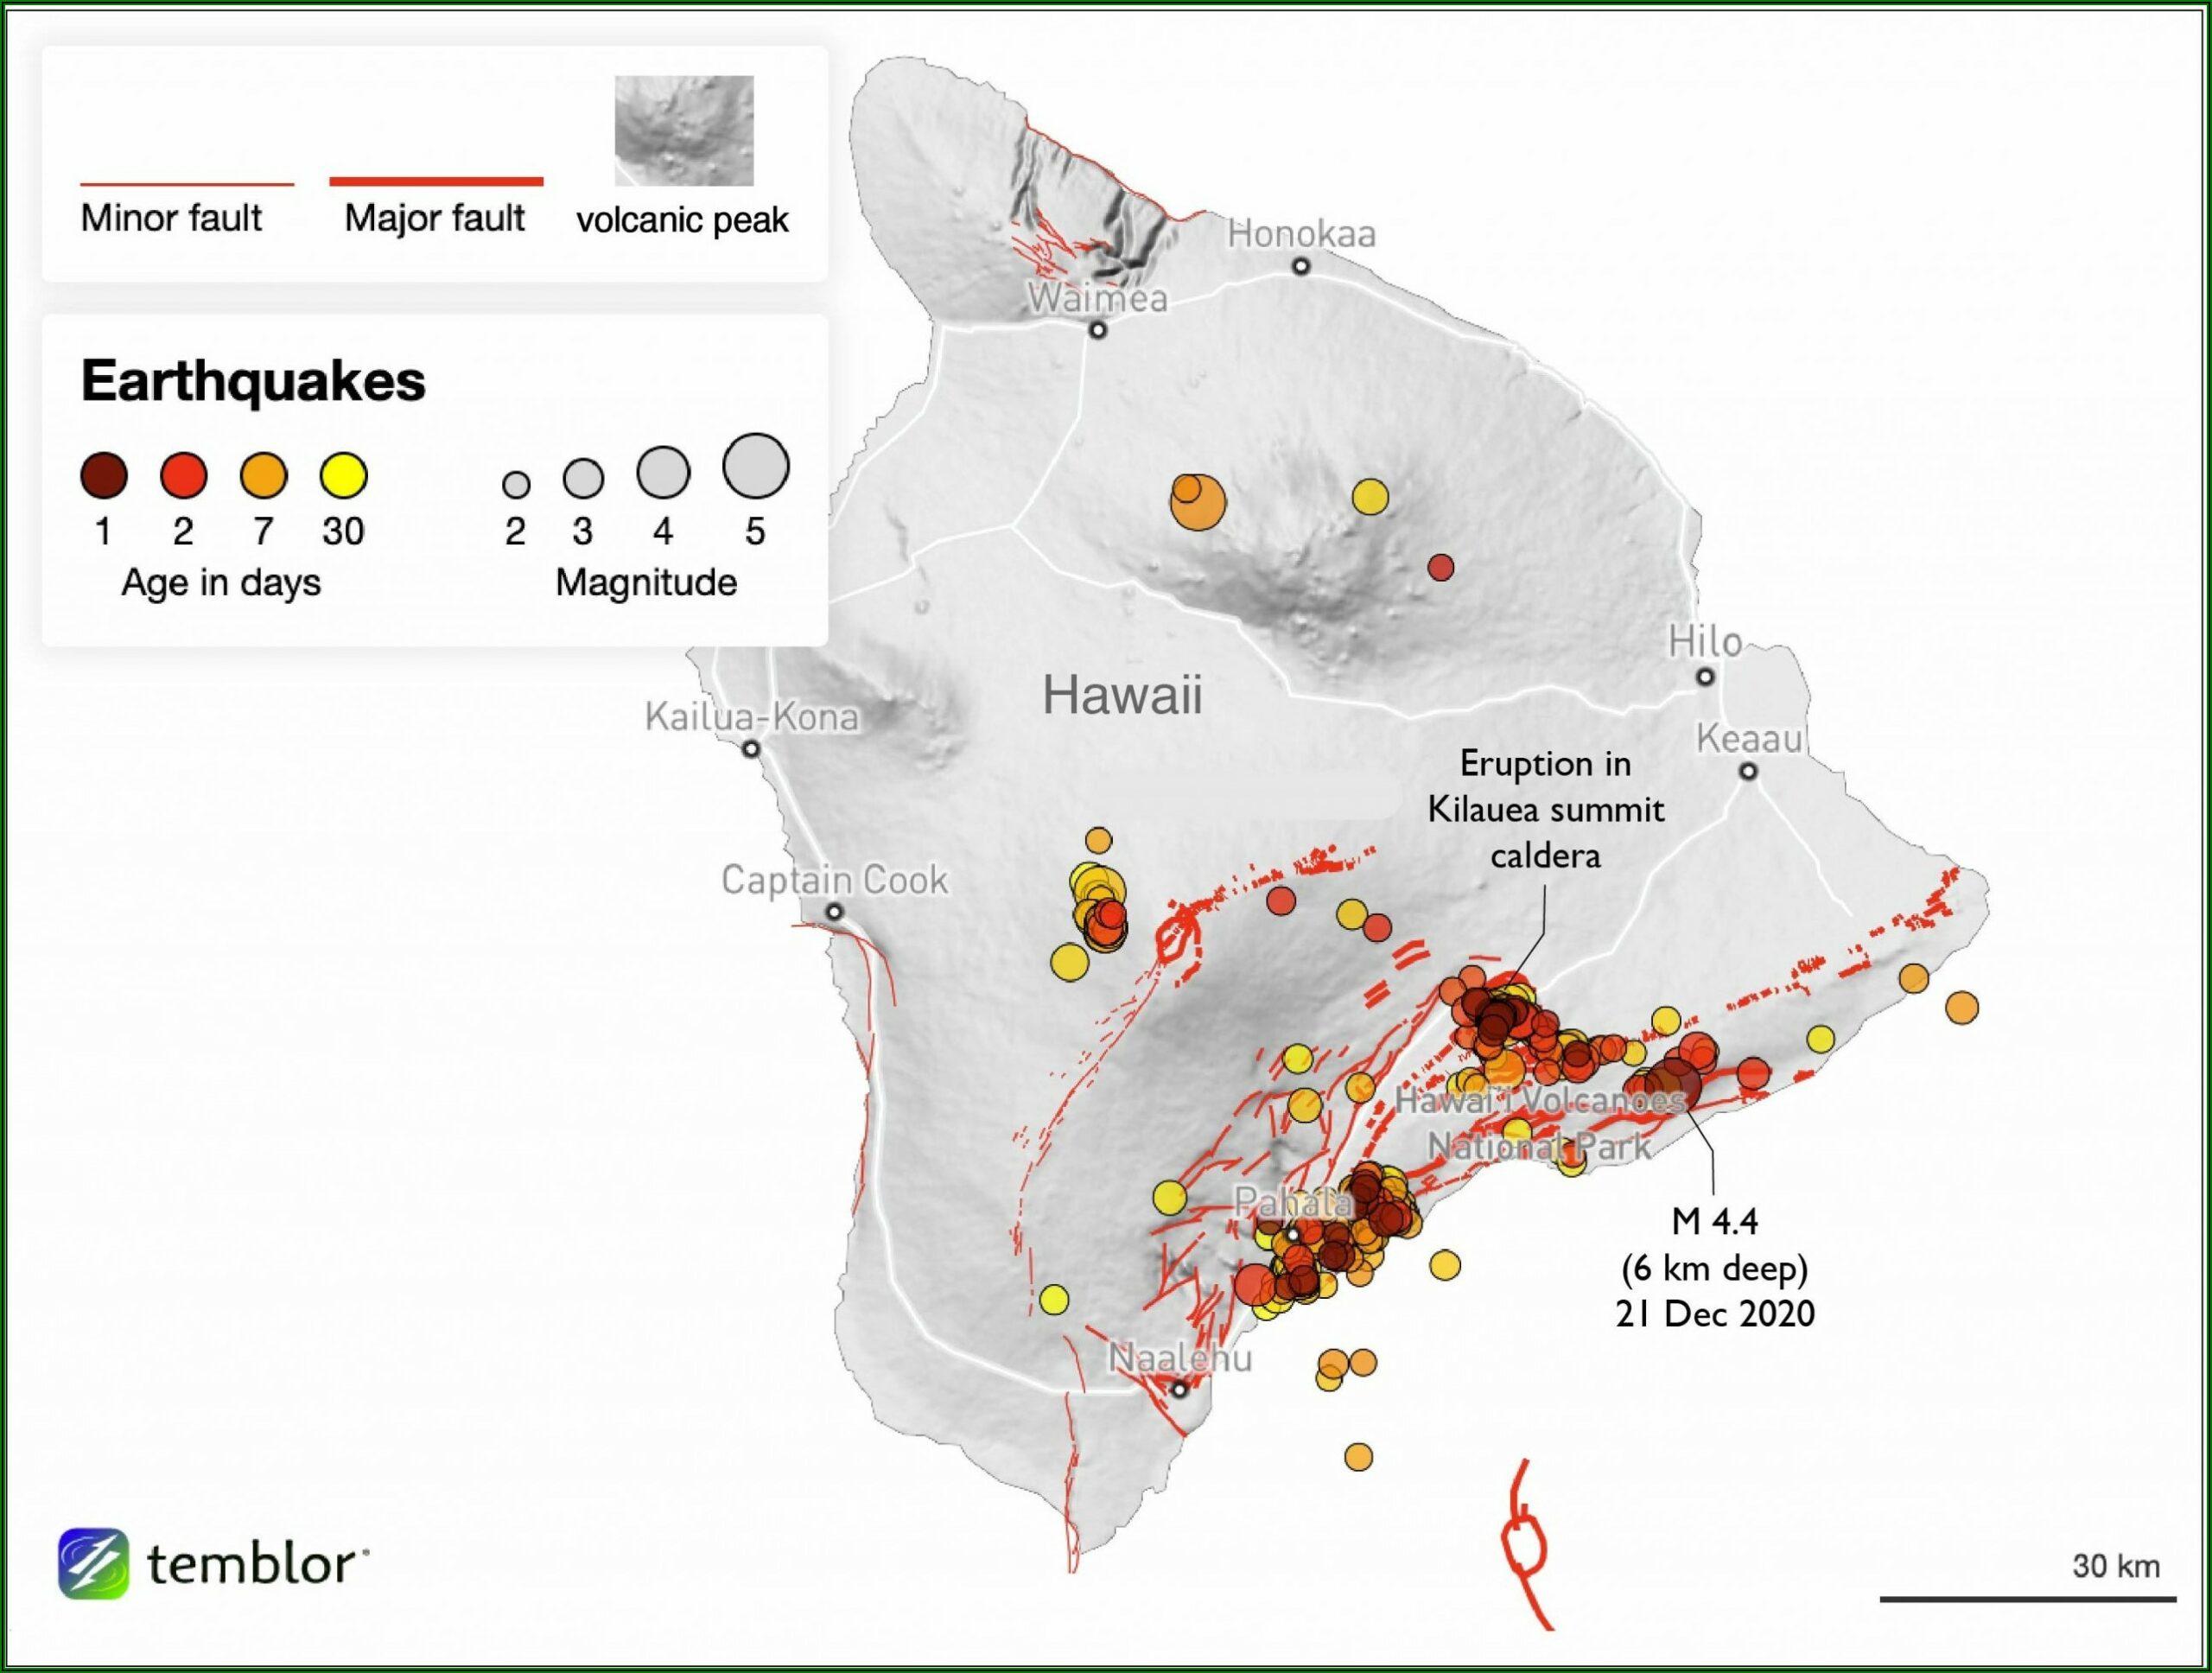 Yellowstone Supervolcano Eruption 2020 Map